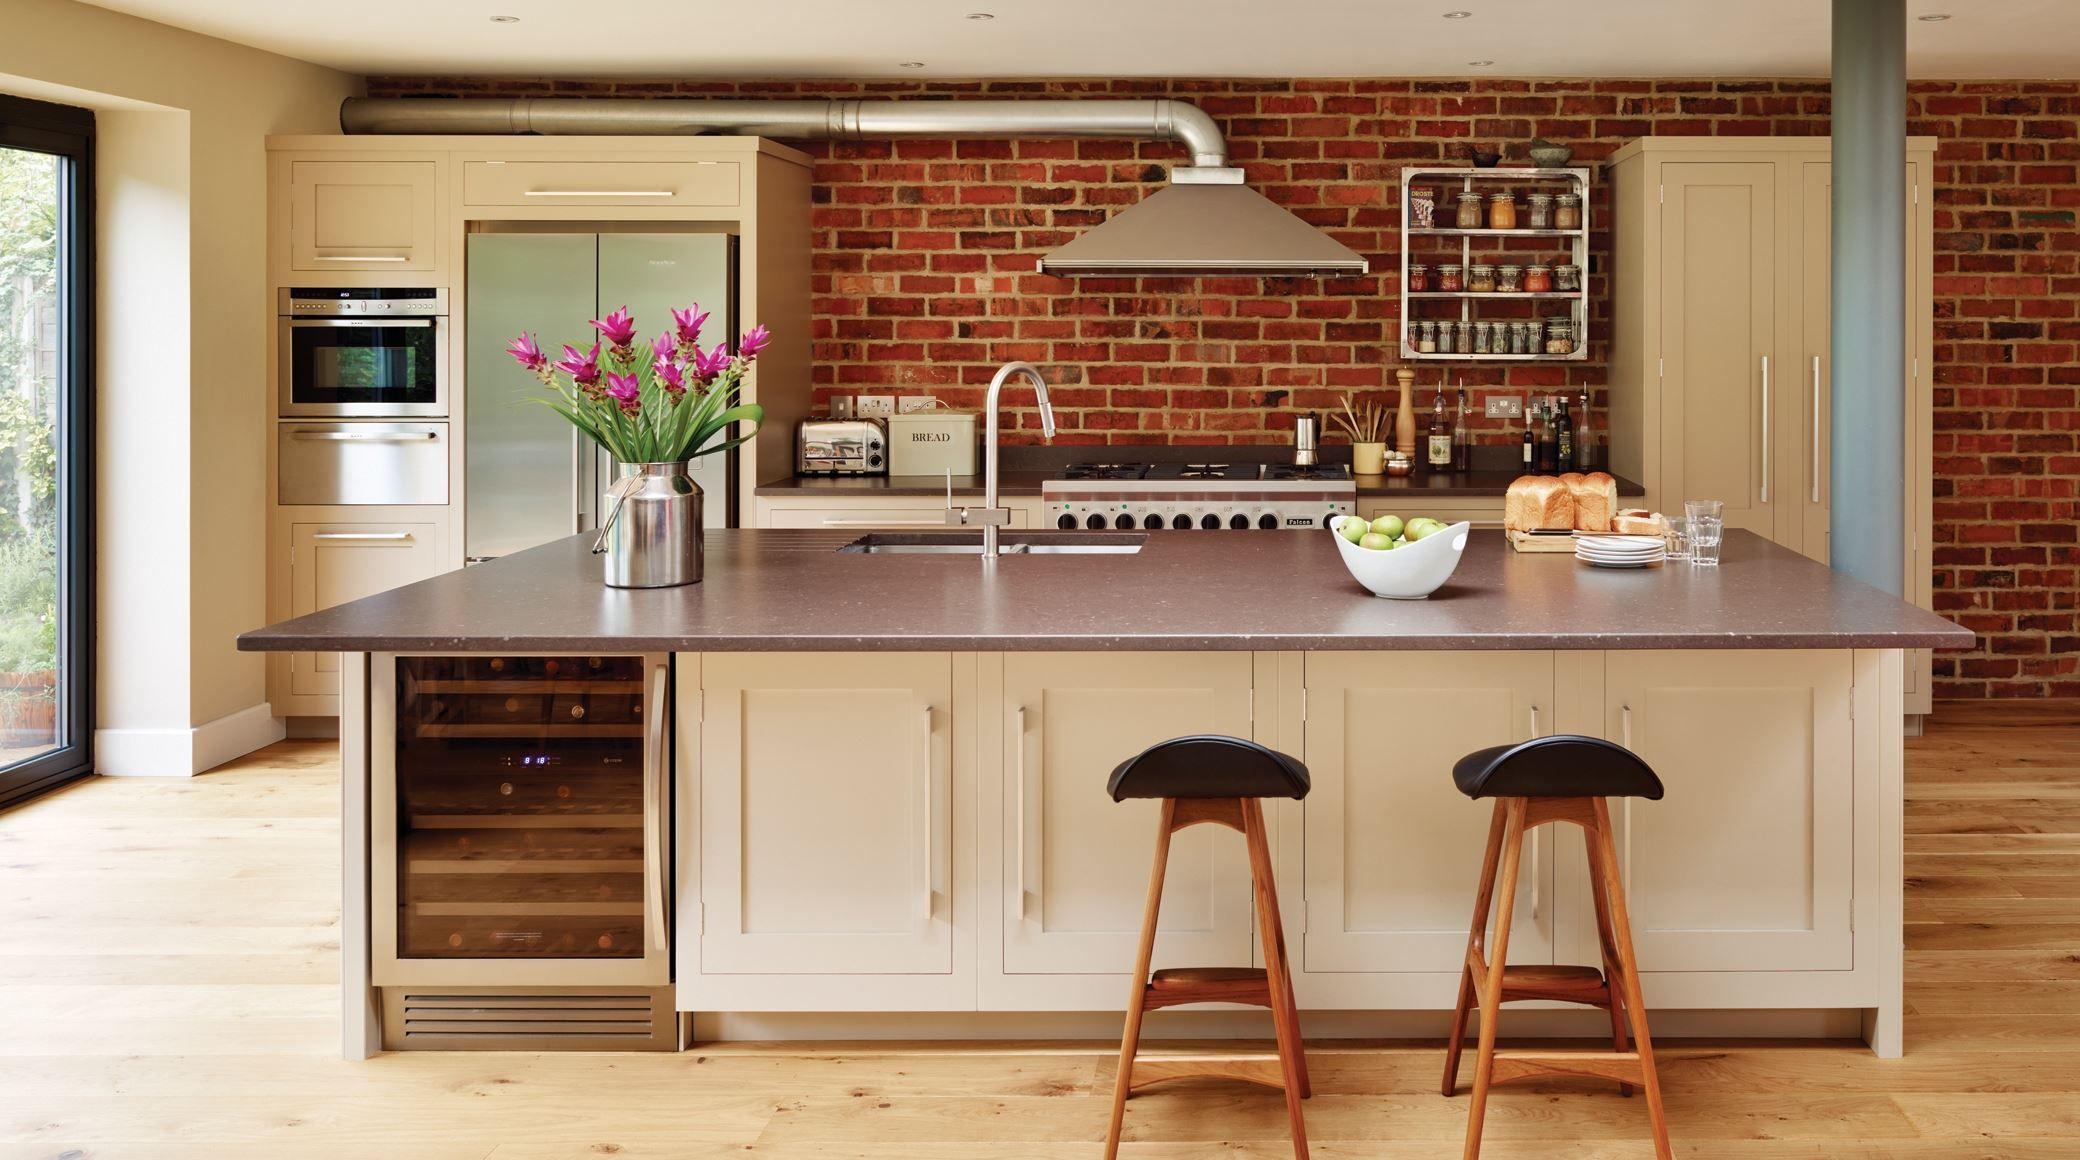 Bespoke Handmade Kitchens from Harvey Jones Kitchens | Kitchen/house ...